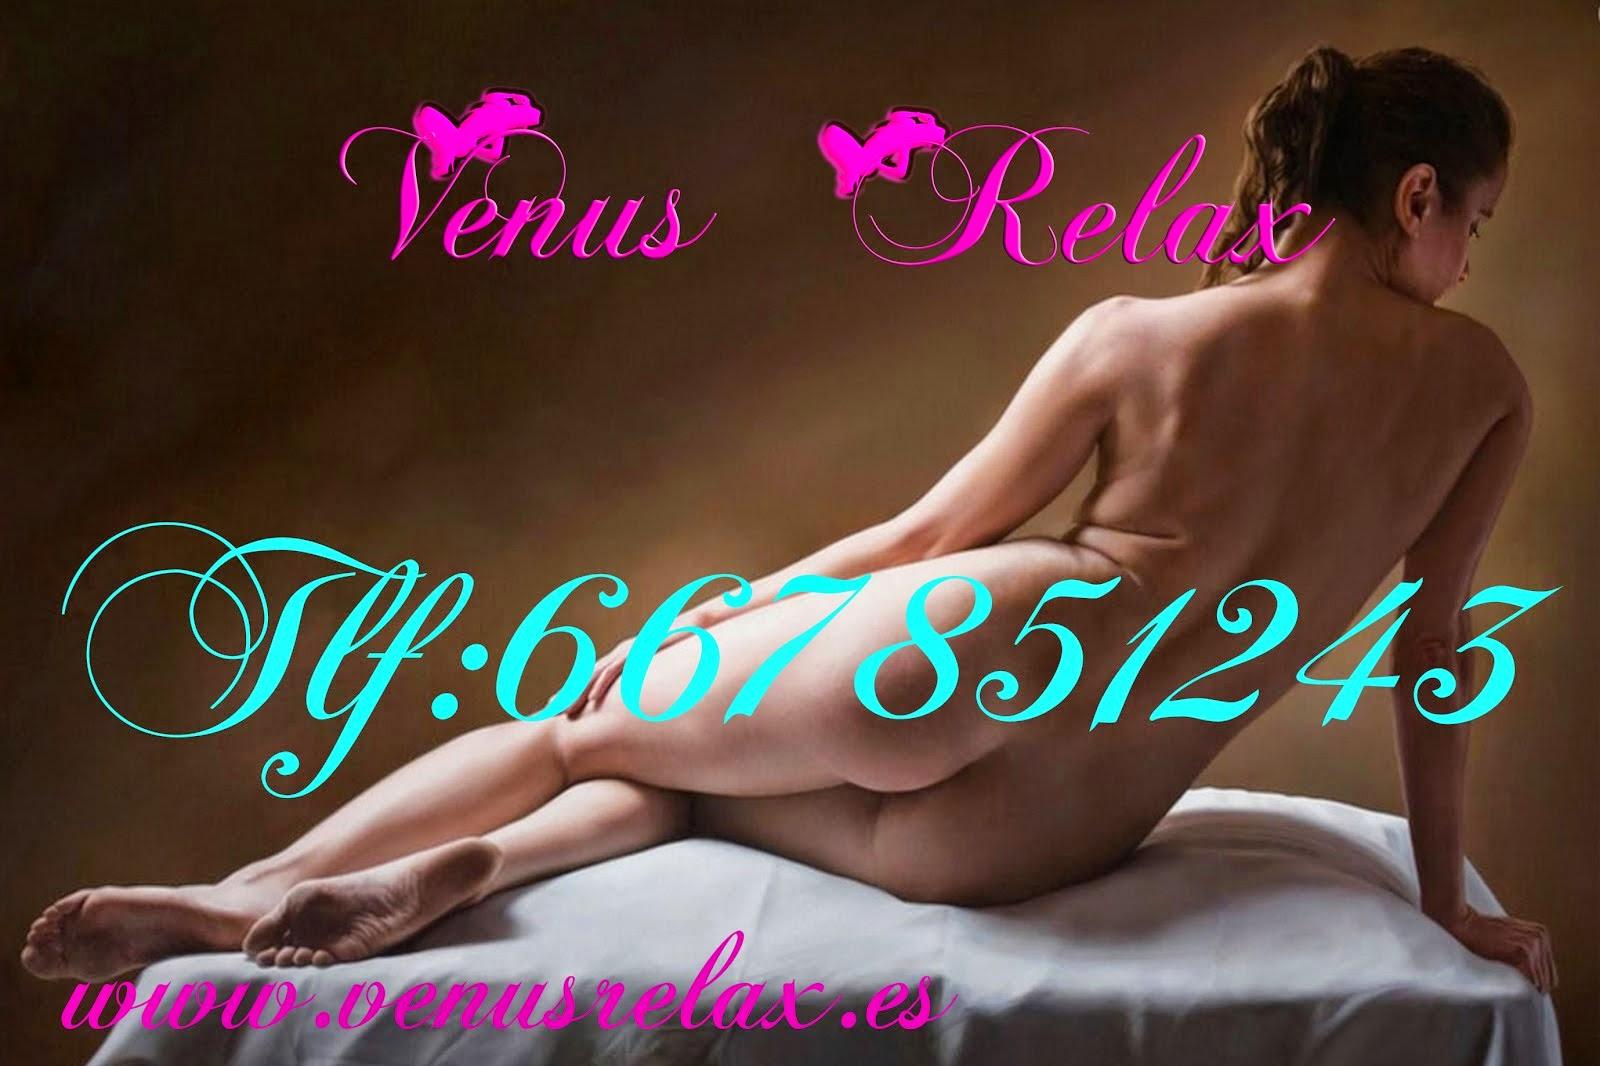 Venus Relax Donosti